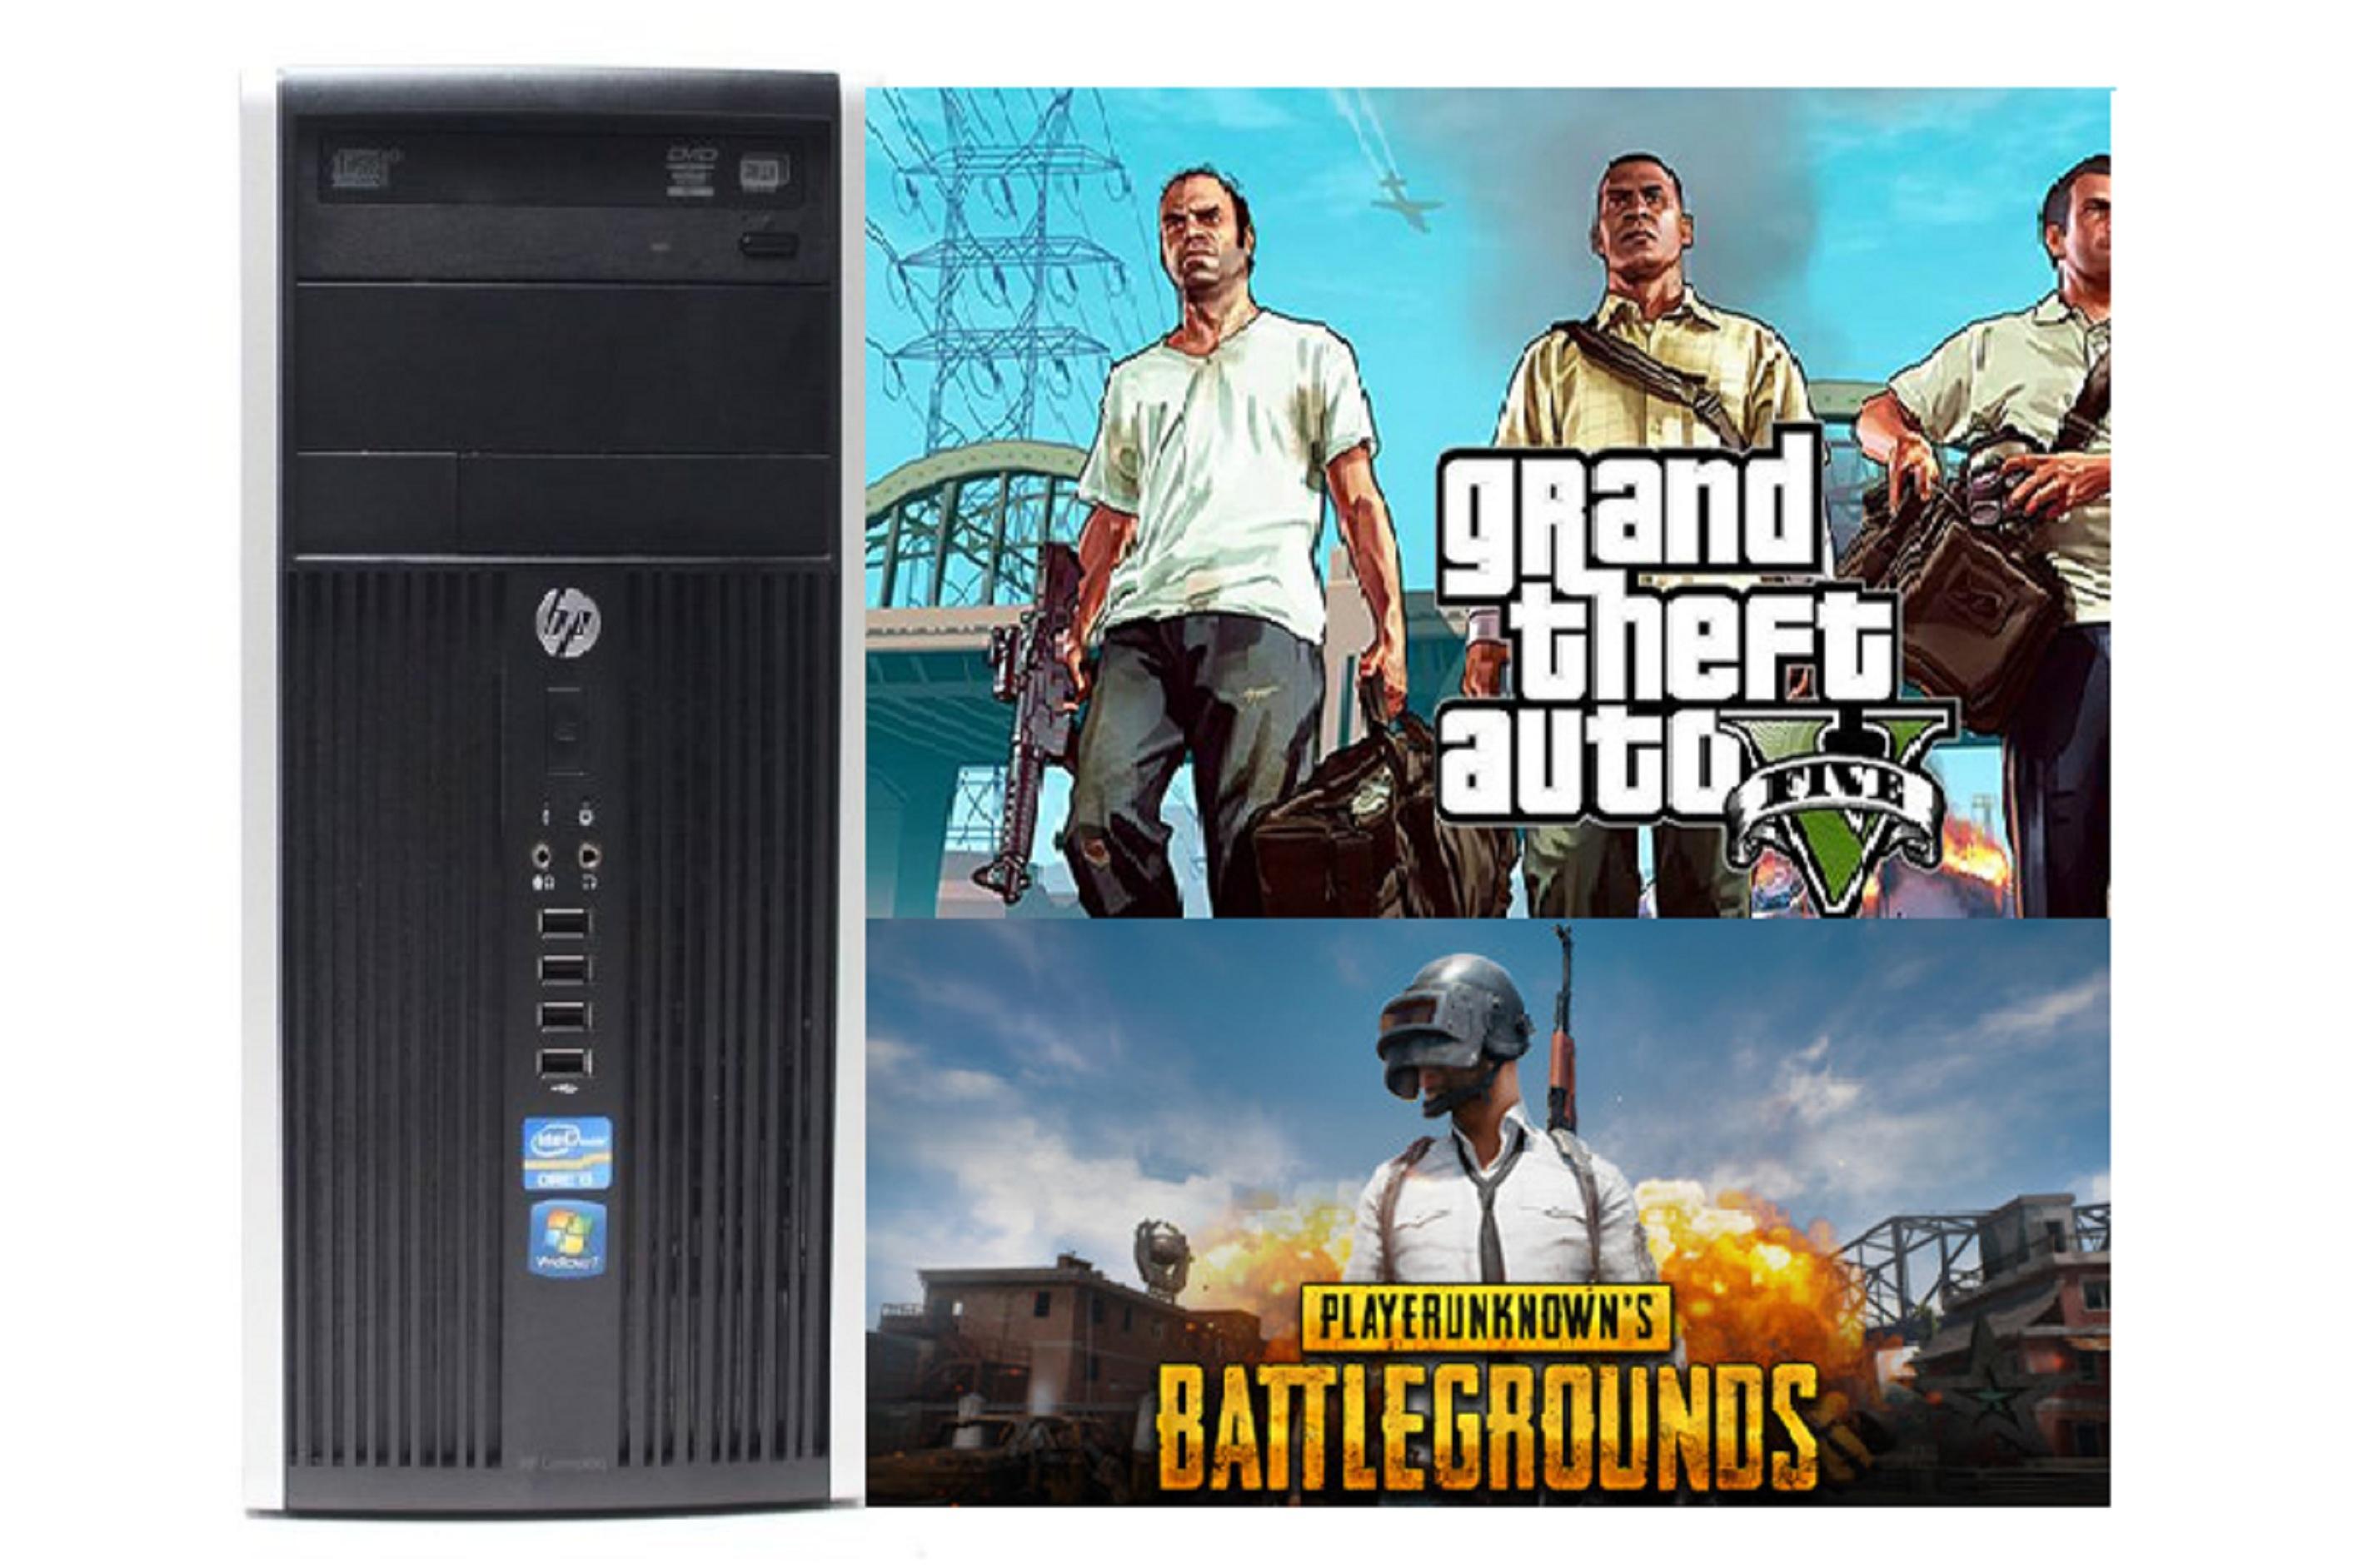 HP 6200 Pro Microtower PC (Intel Core i5 2nd Generation 4GB RAM DDR3, 500GB  HDD,DVDRW, 1 Gb Graphics Card